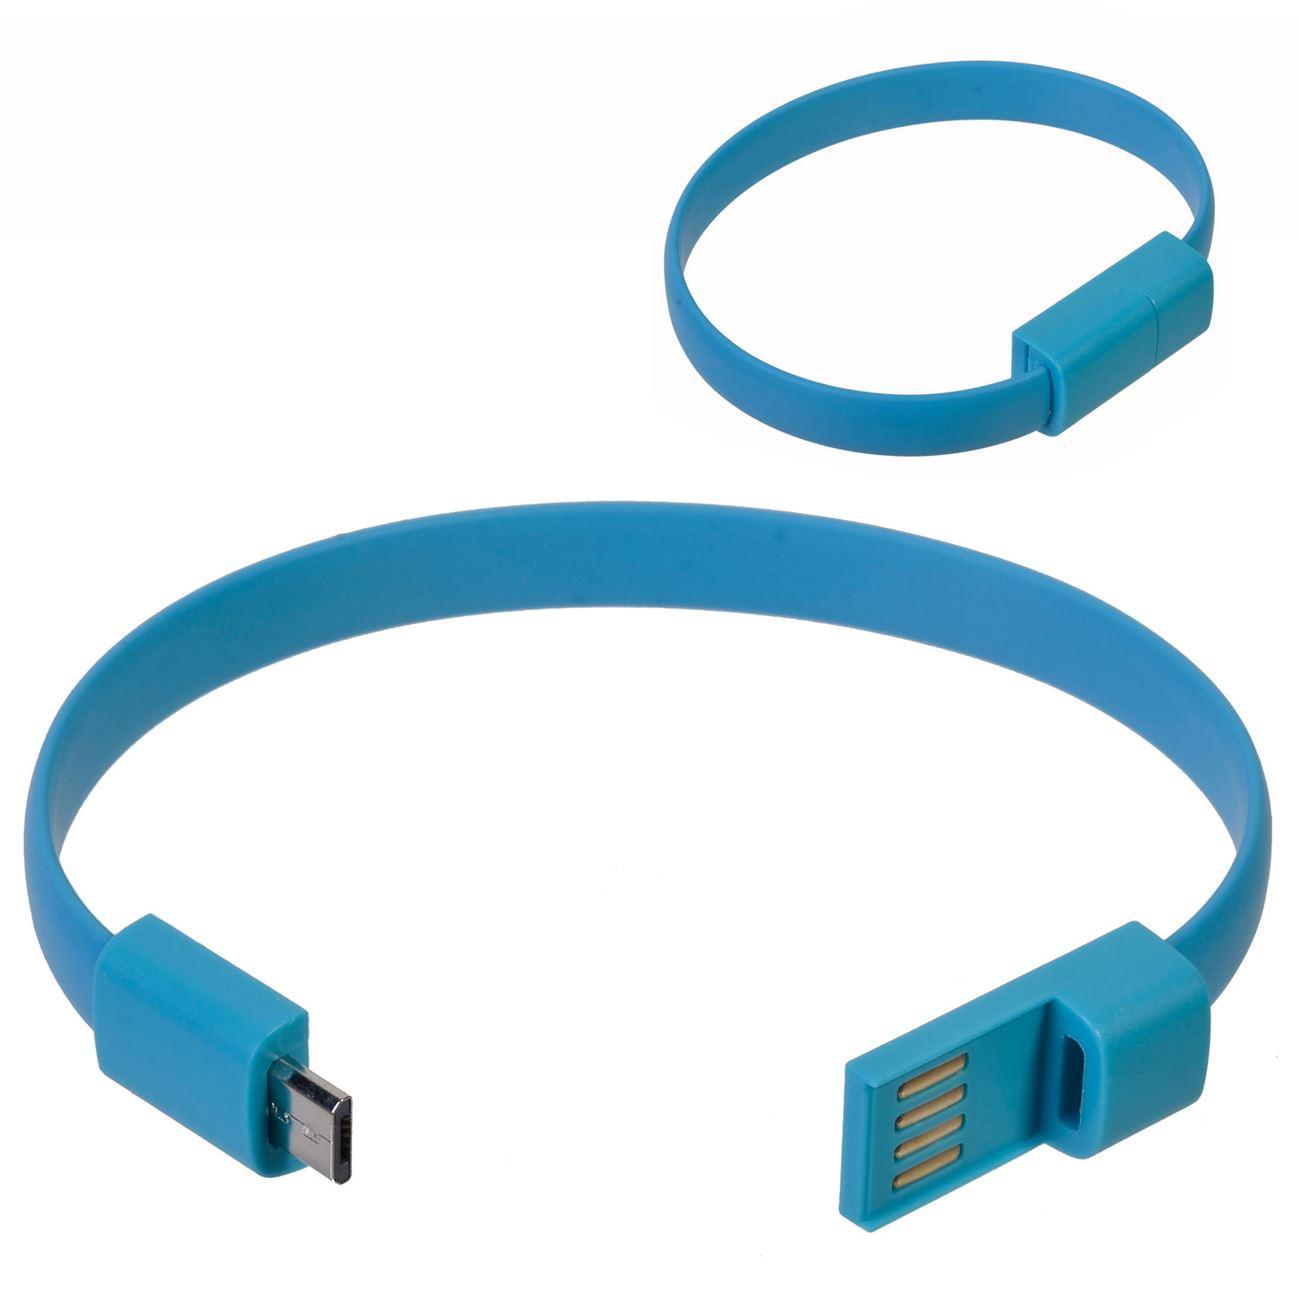 d25ab32696 Βραχιόλι - Καλώδιο Micro USB Σιελ   Καλώδια Φόρτισης Κινητών-Tablet ...